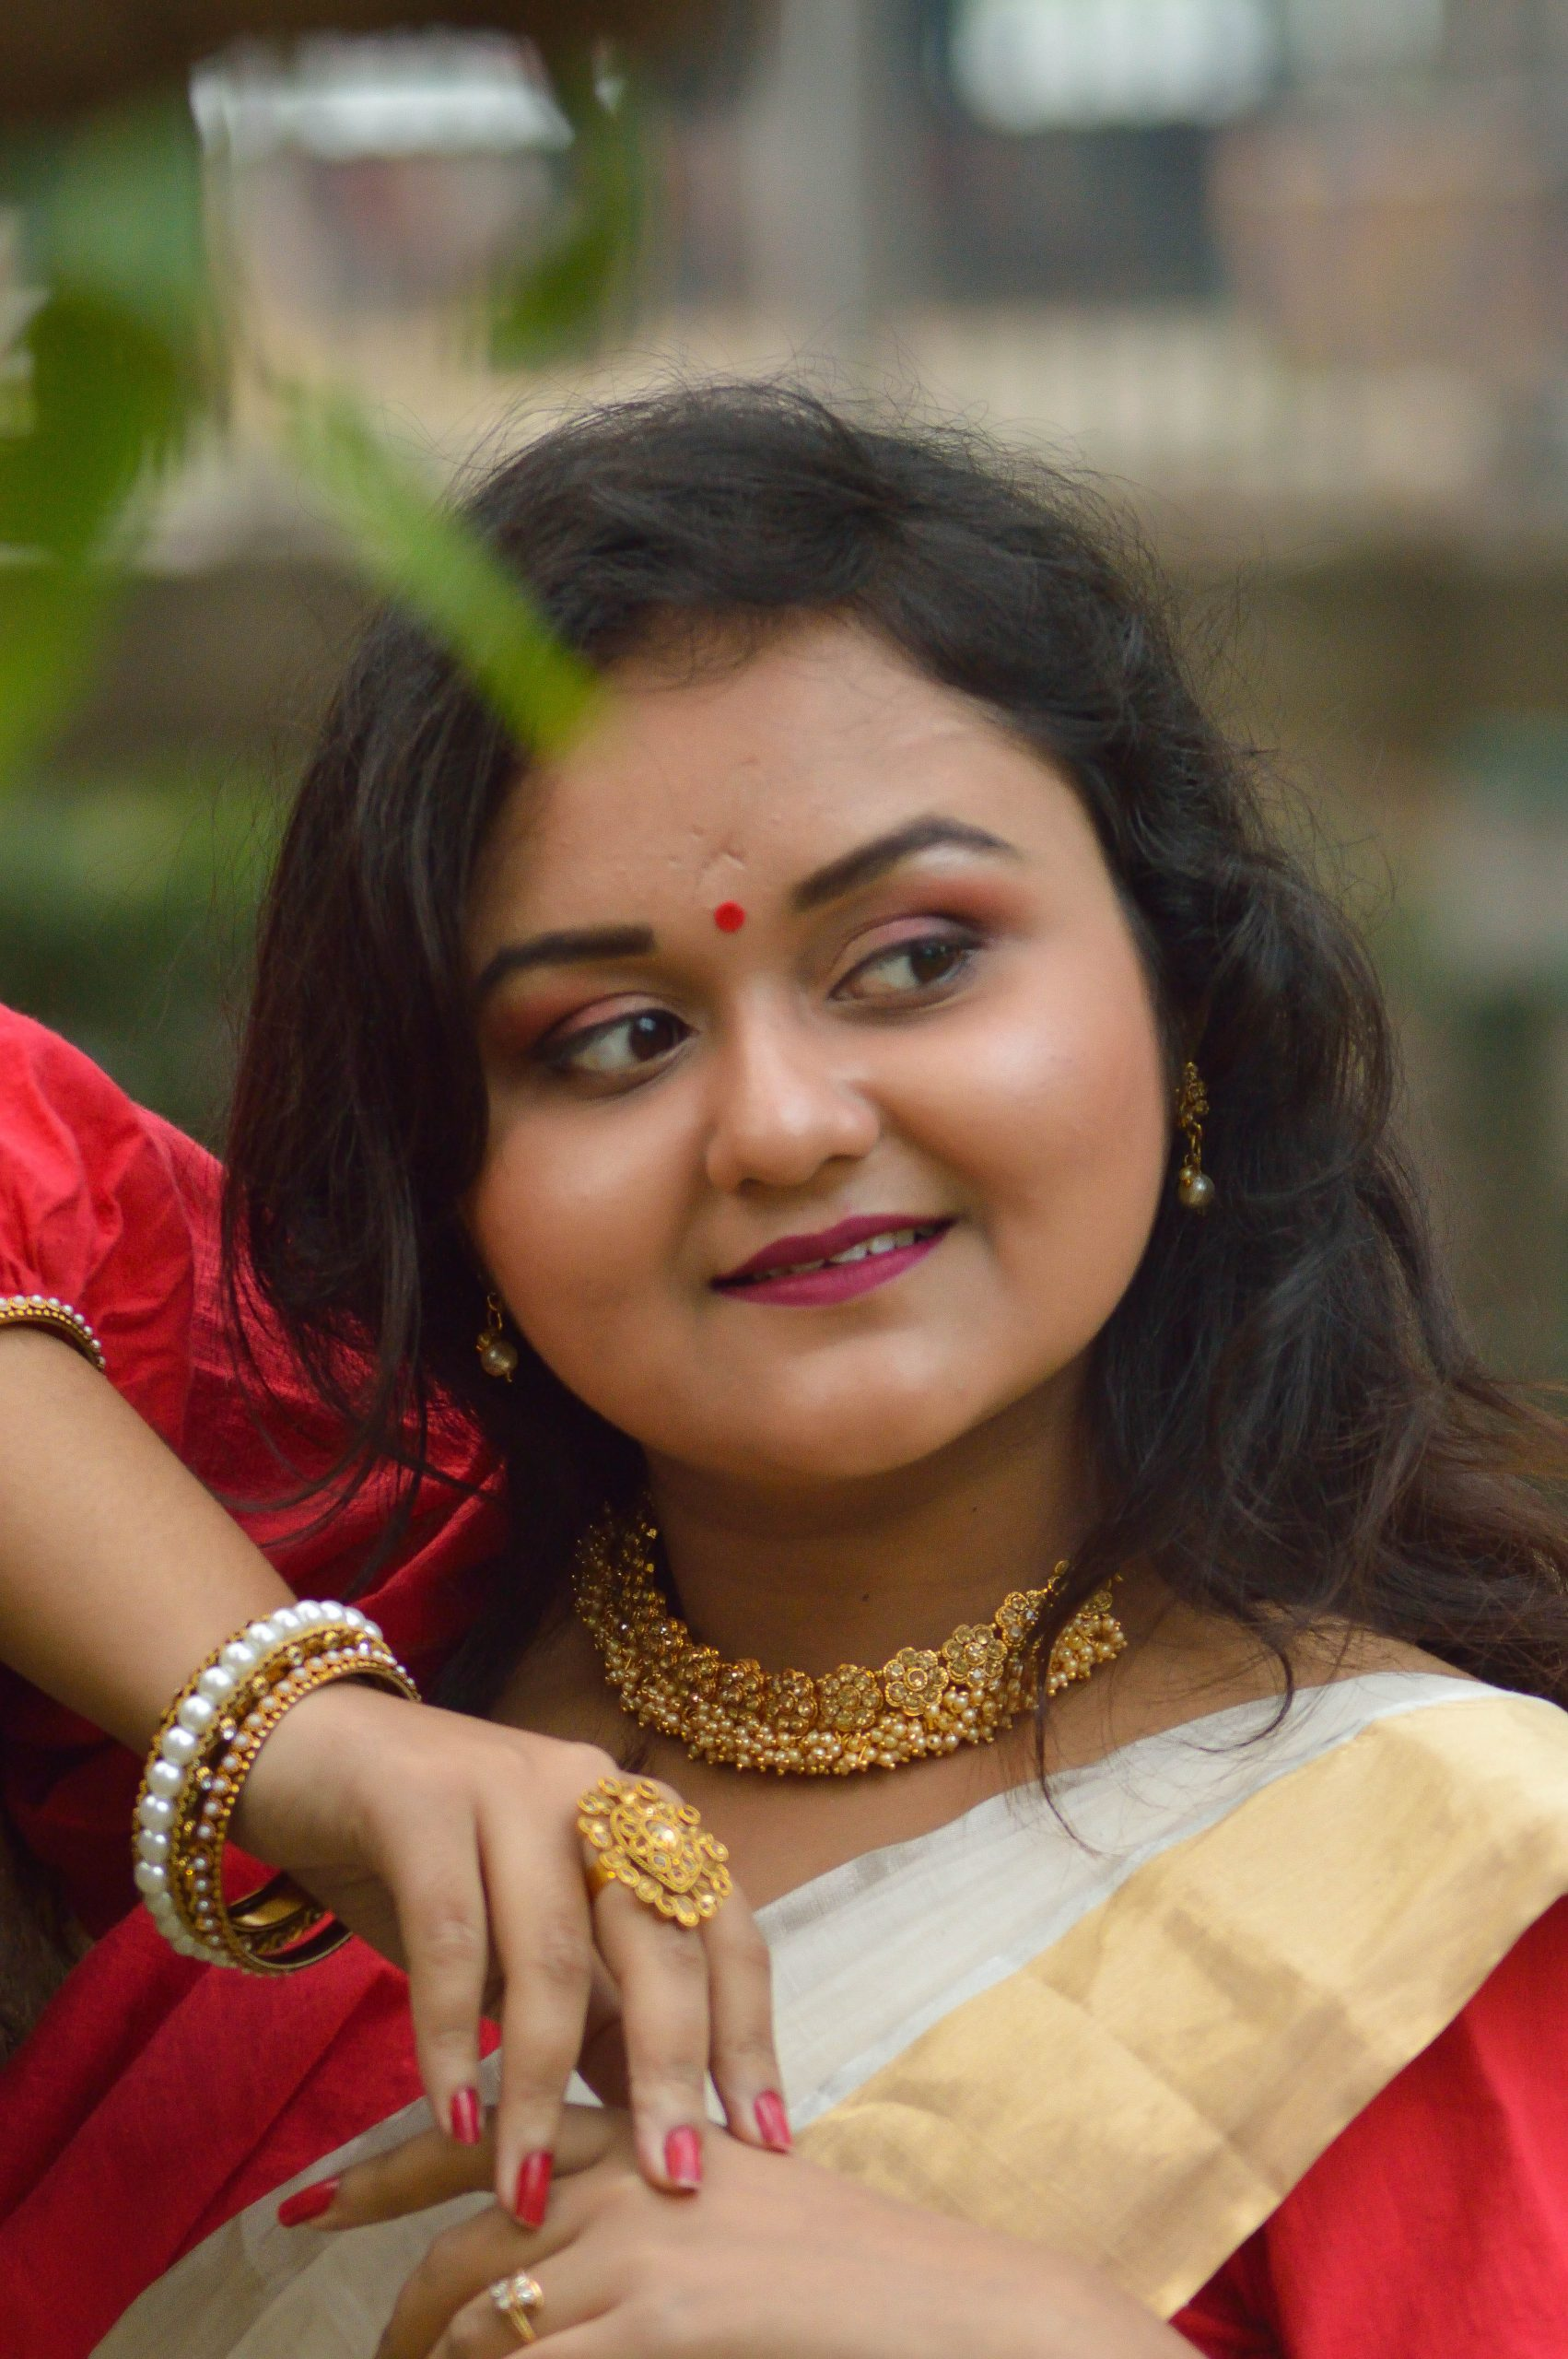 indian woman posing